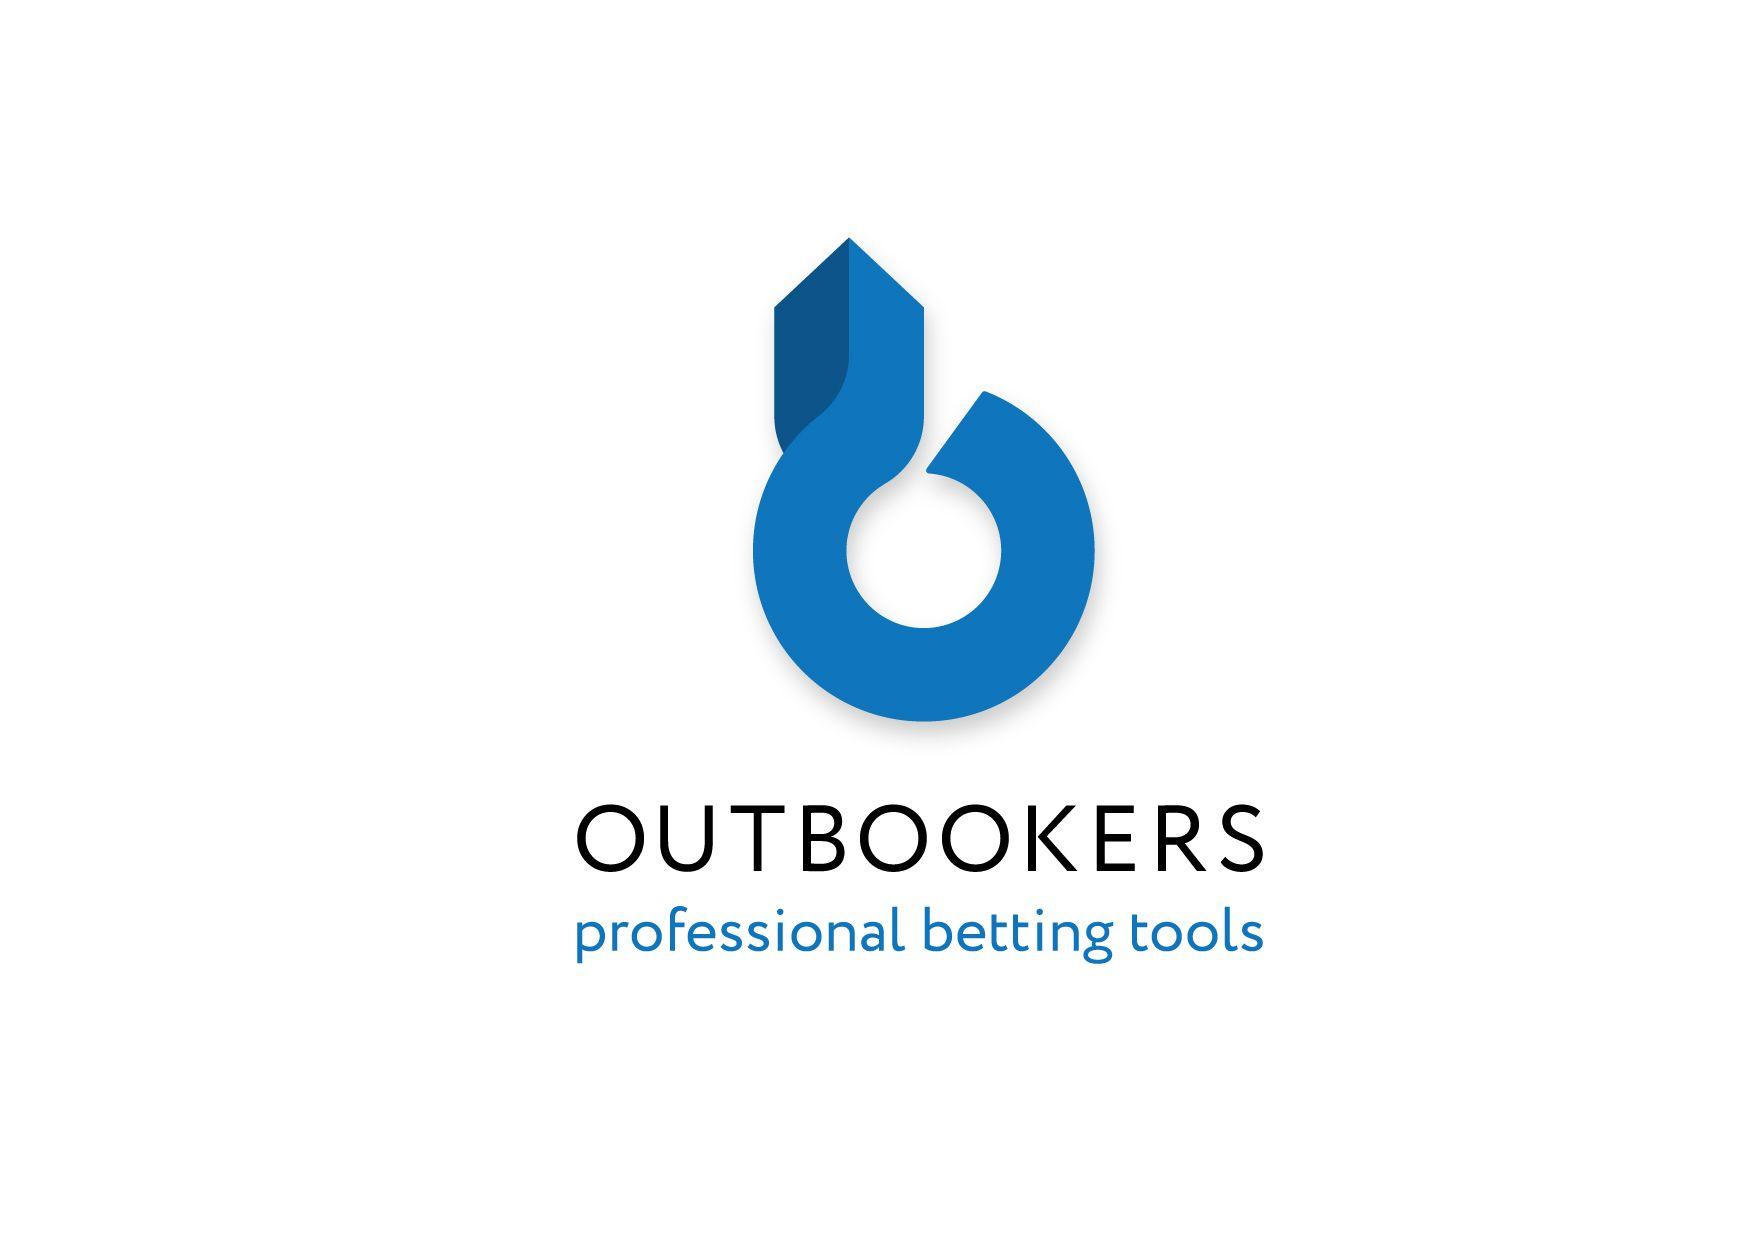 Логотип для компании (спортивная аналитика) - дизайнер Shatiks